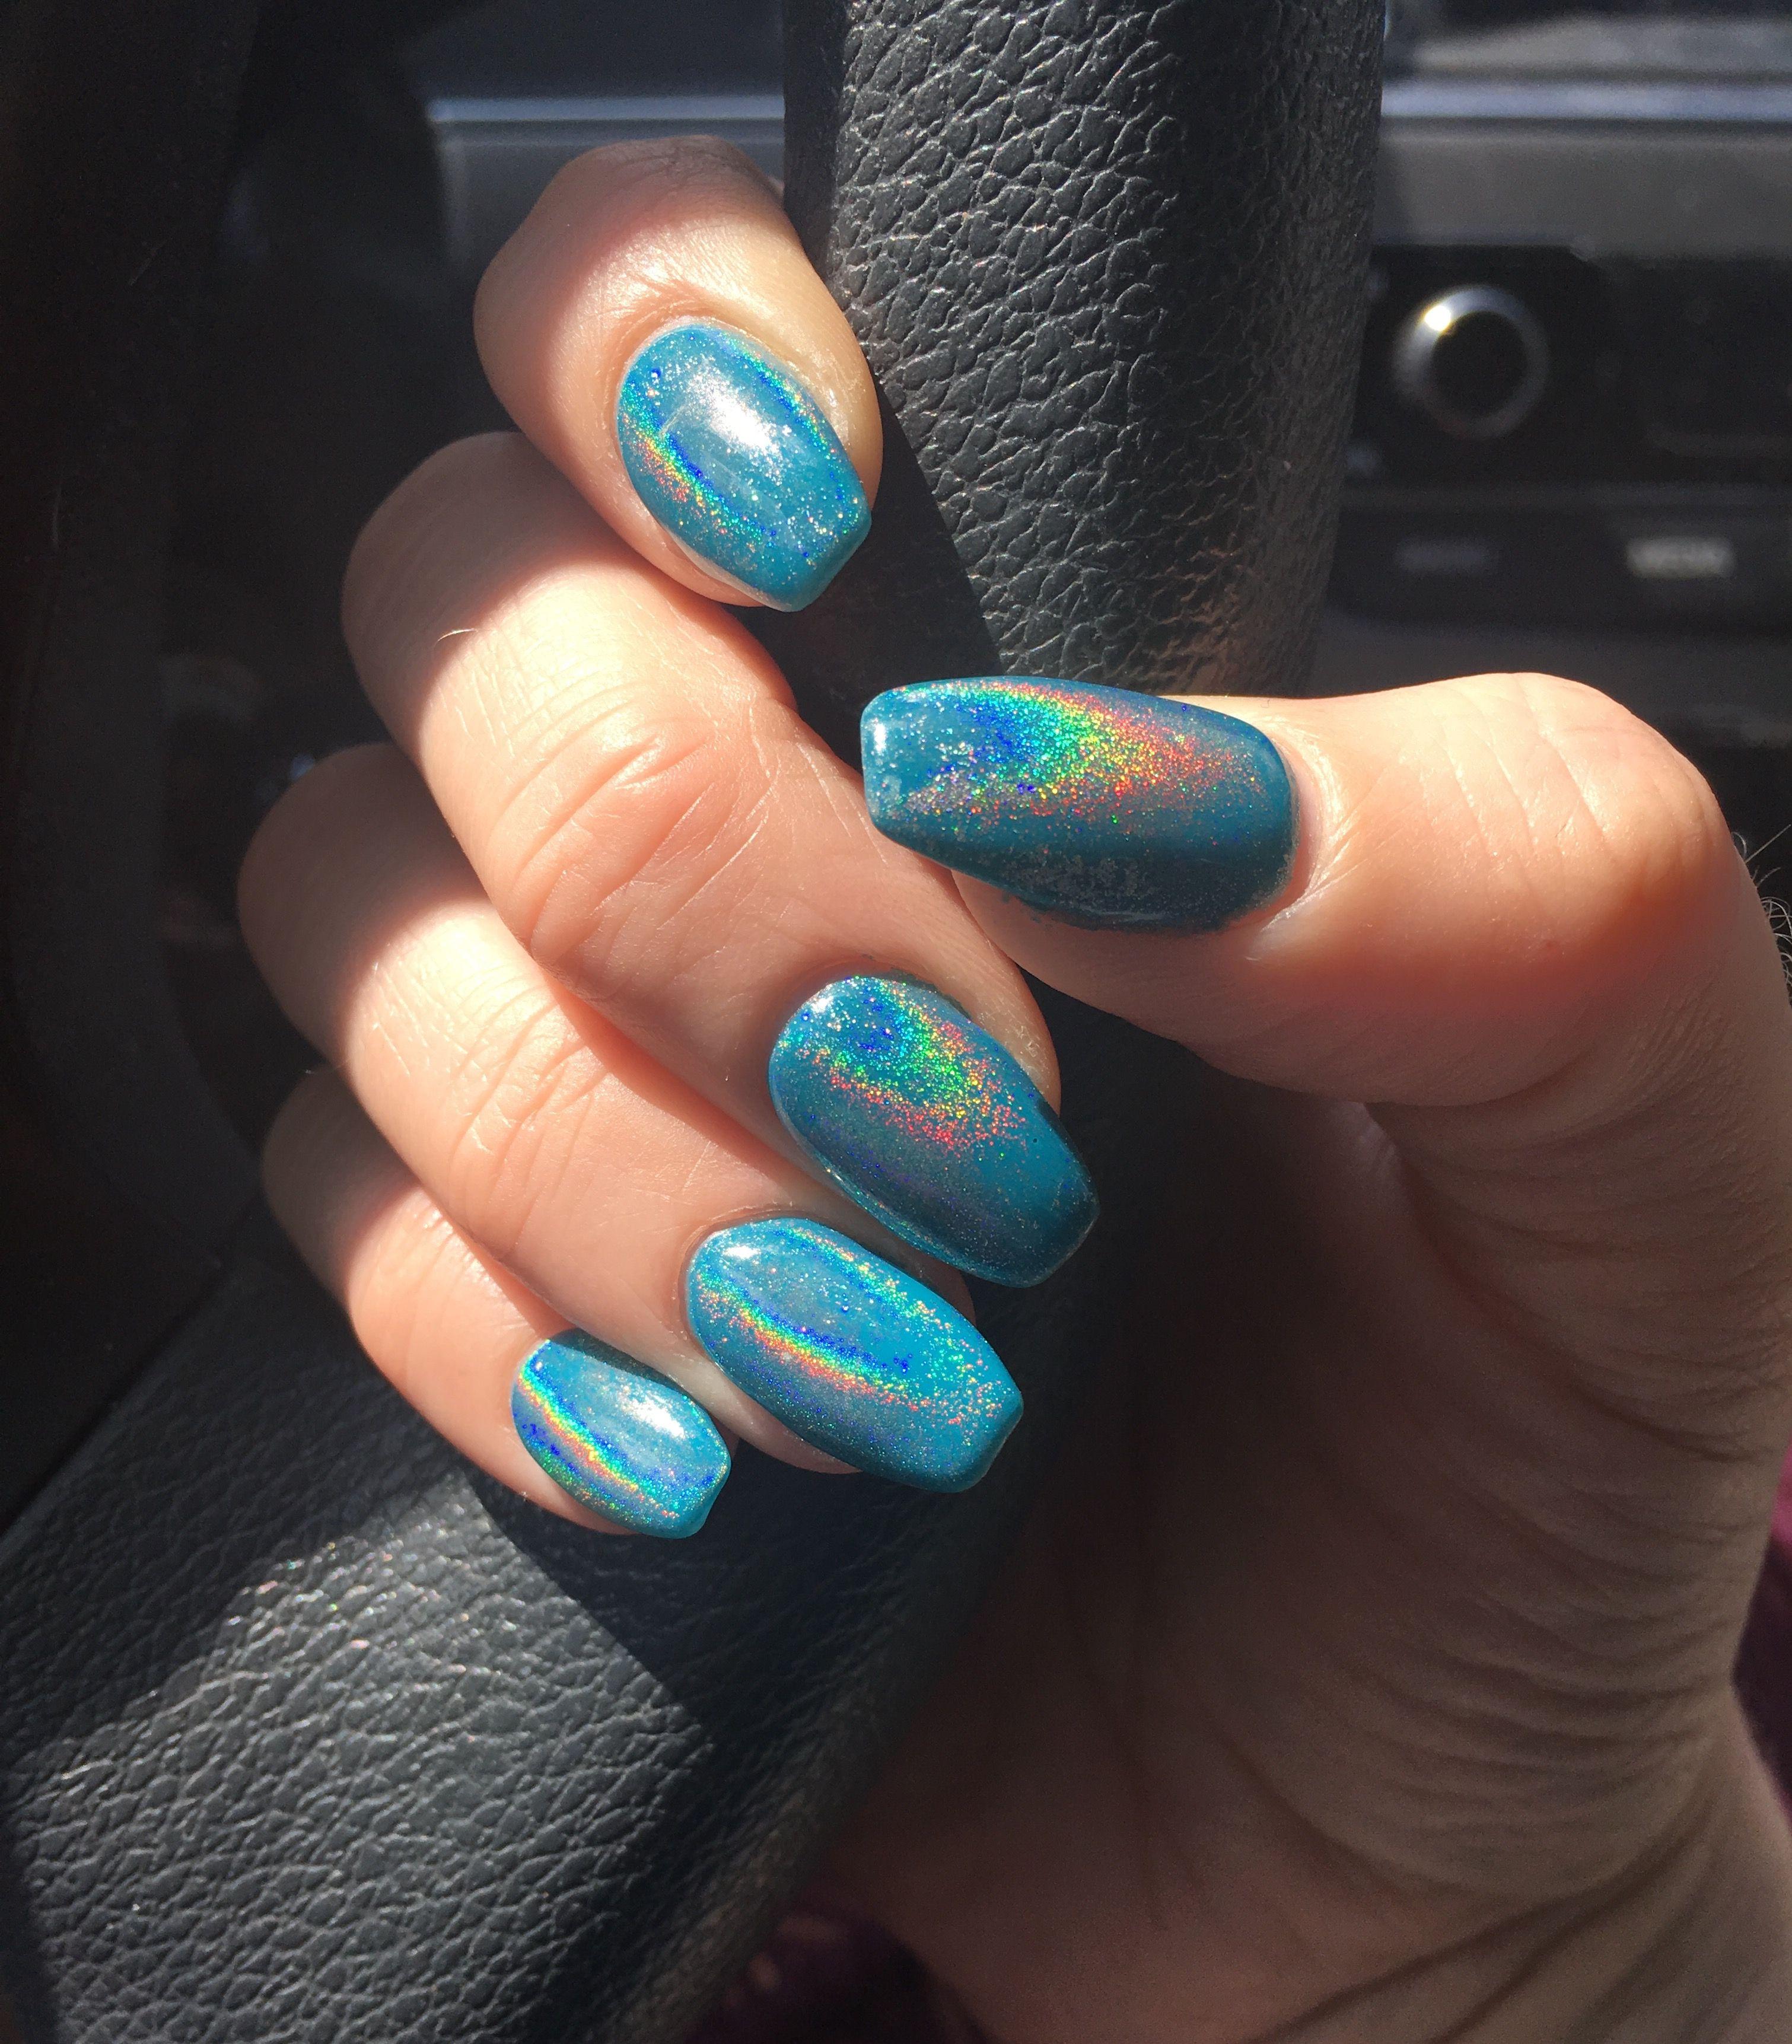 Unicorn nails, chrome nails, 2017 nail trends, summer nails, mermaid ...